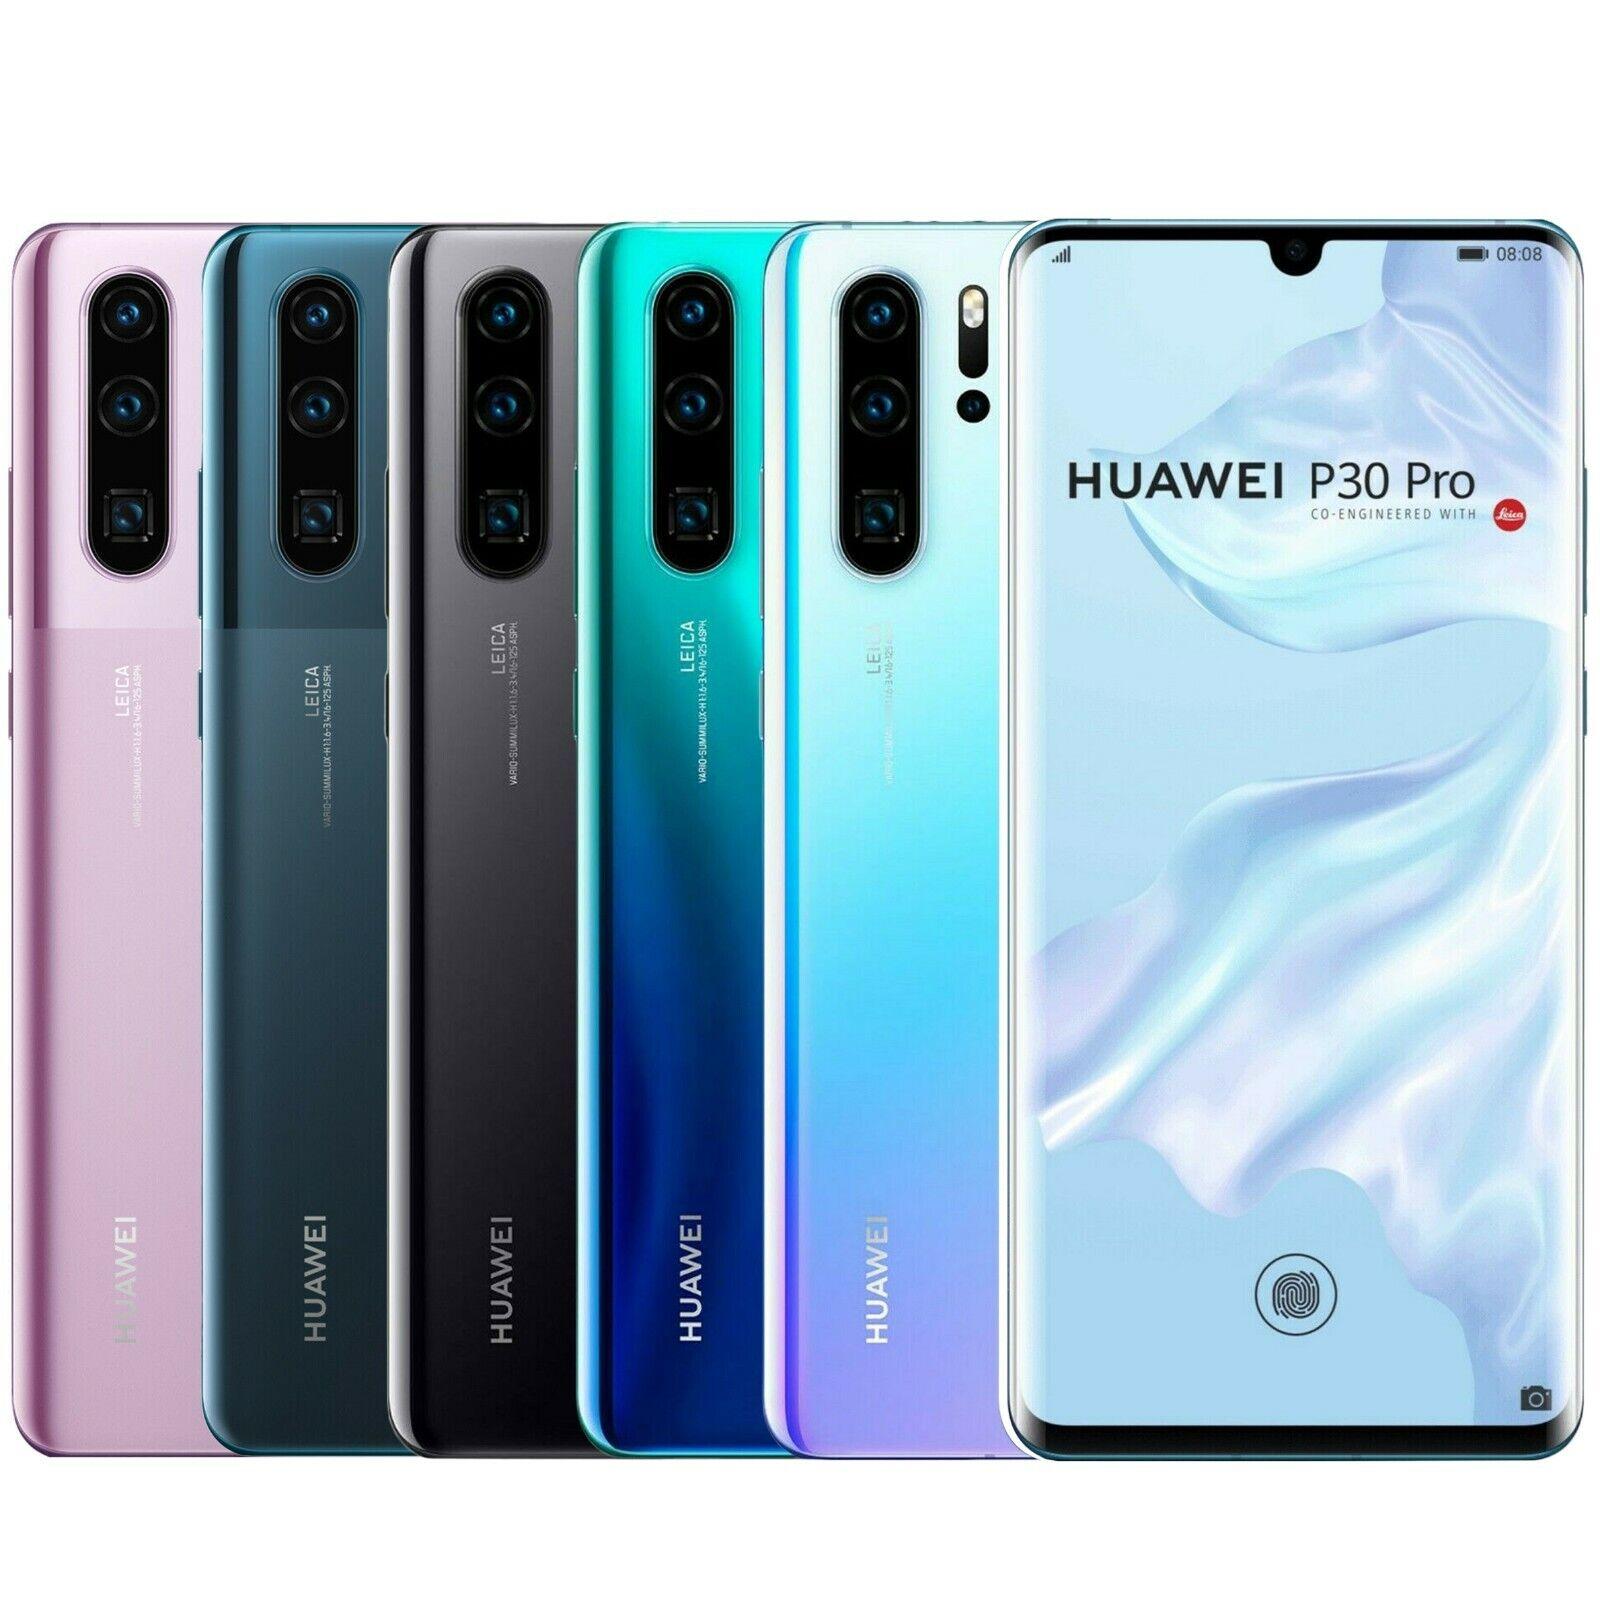 Huawei P30 Pro 256GB VOG-L29 Dual Sim (FACTORY UNLOCKED) 6.47